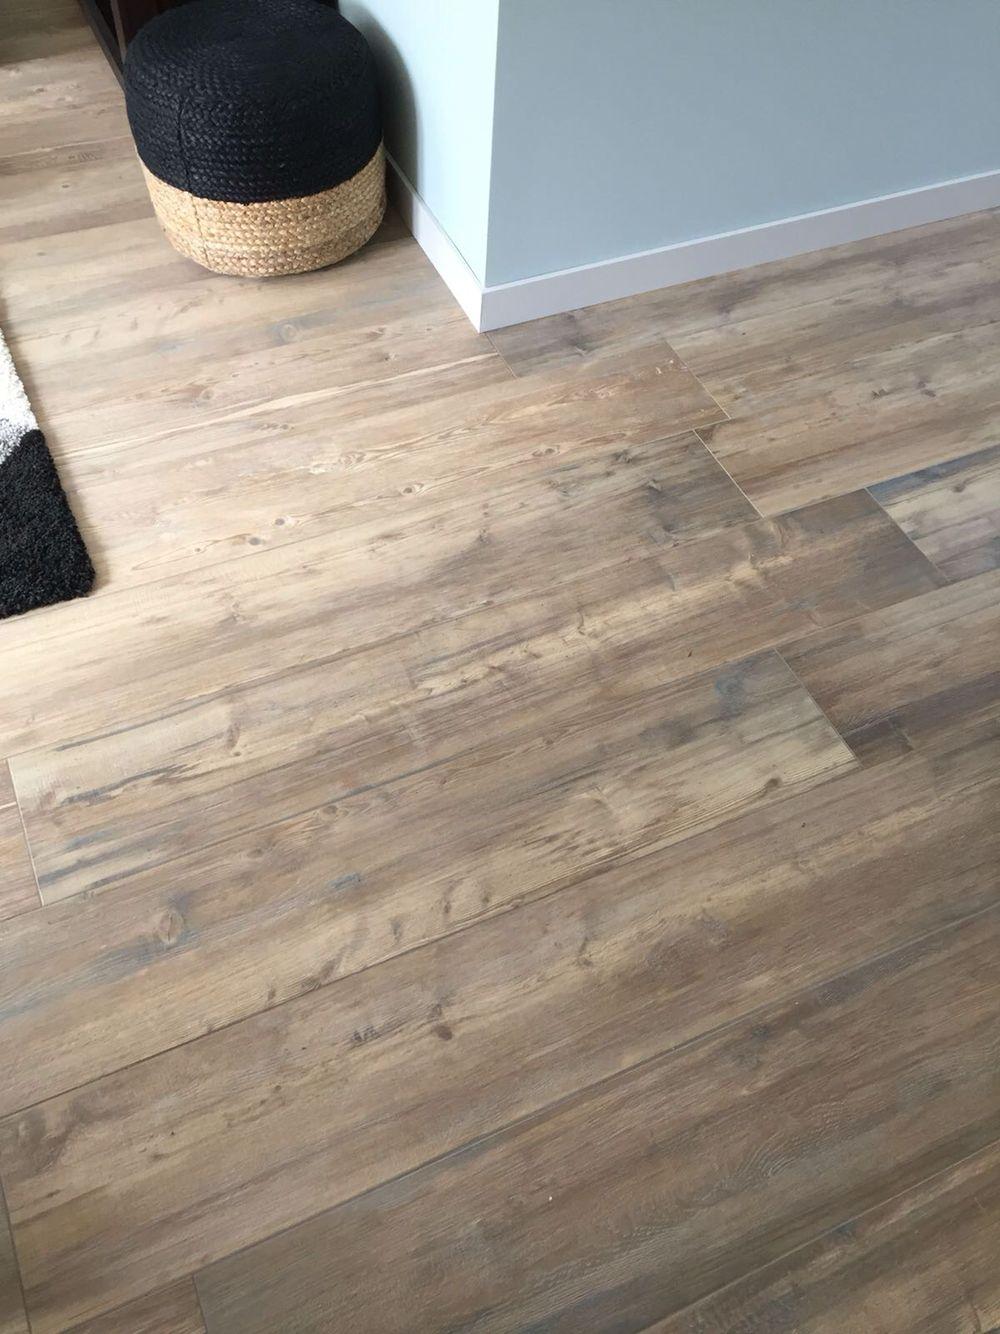 Keramisch parket houtlook tegels refin larix natural 25x150 cm keramisch parket pinterest - Ragno tegels ...